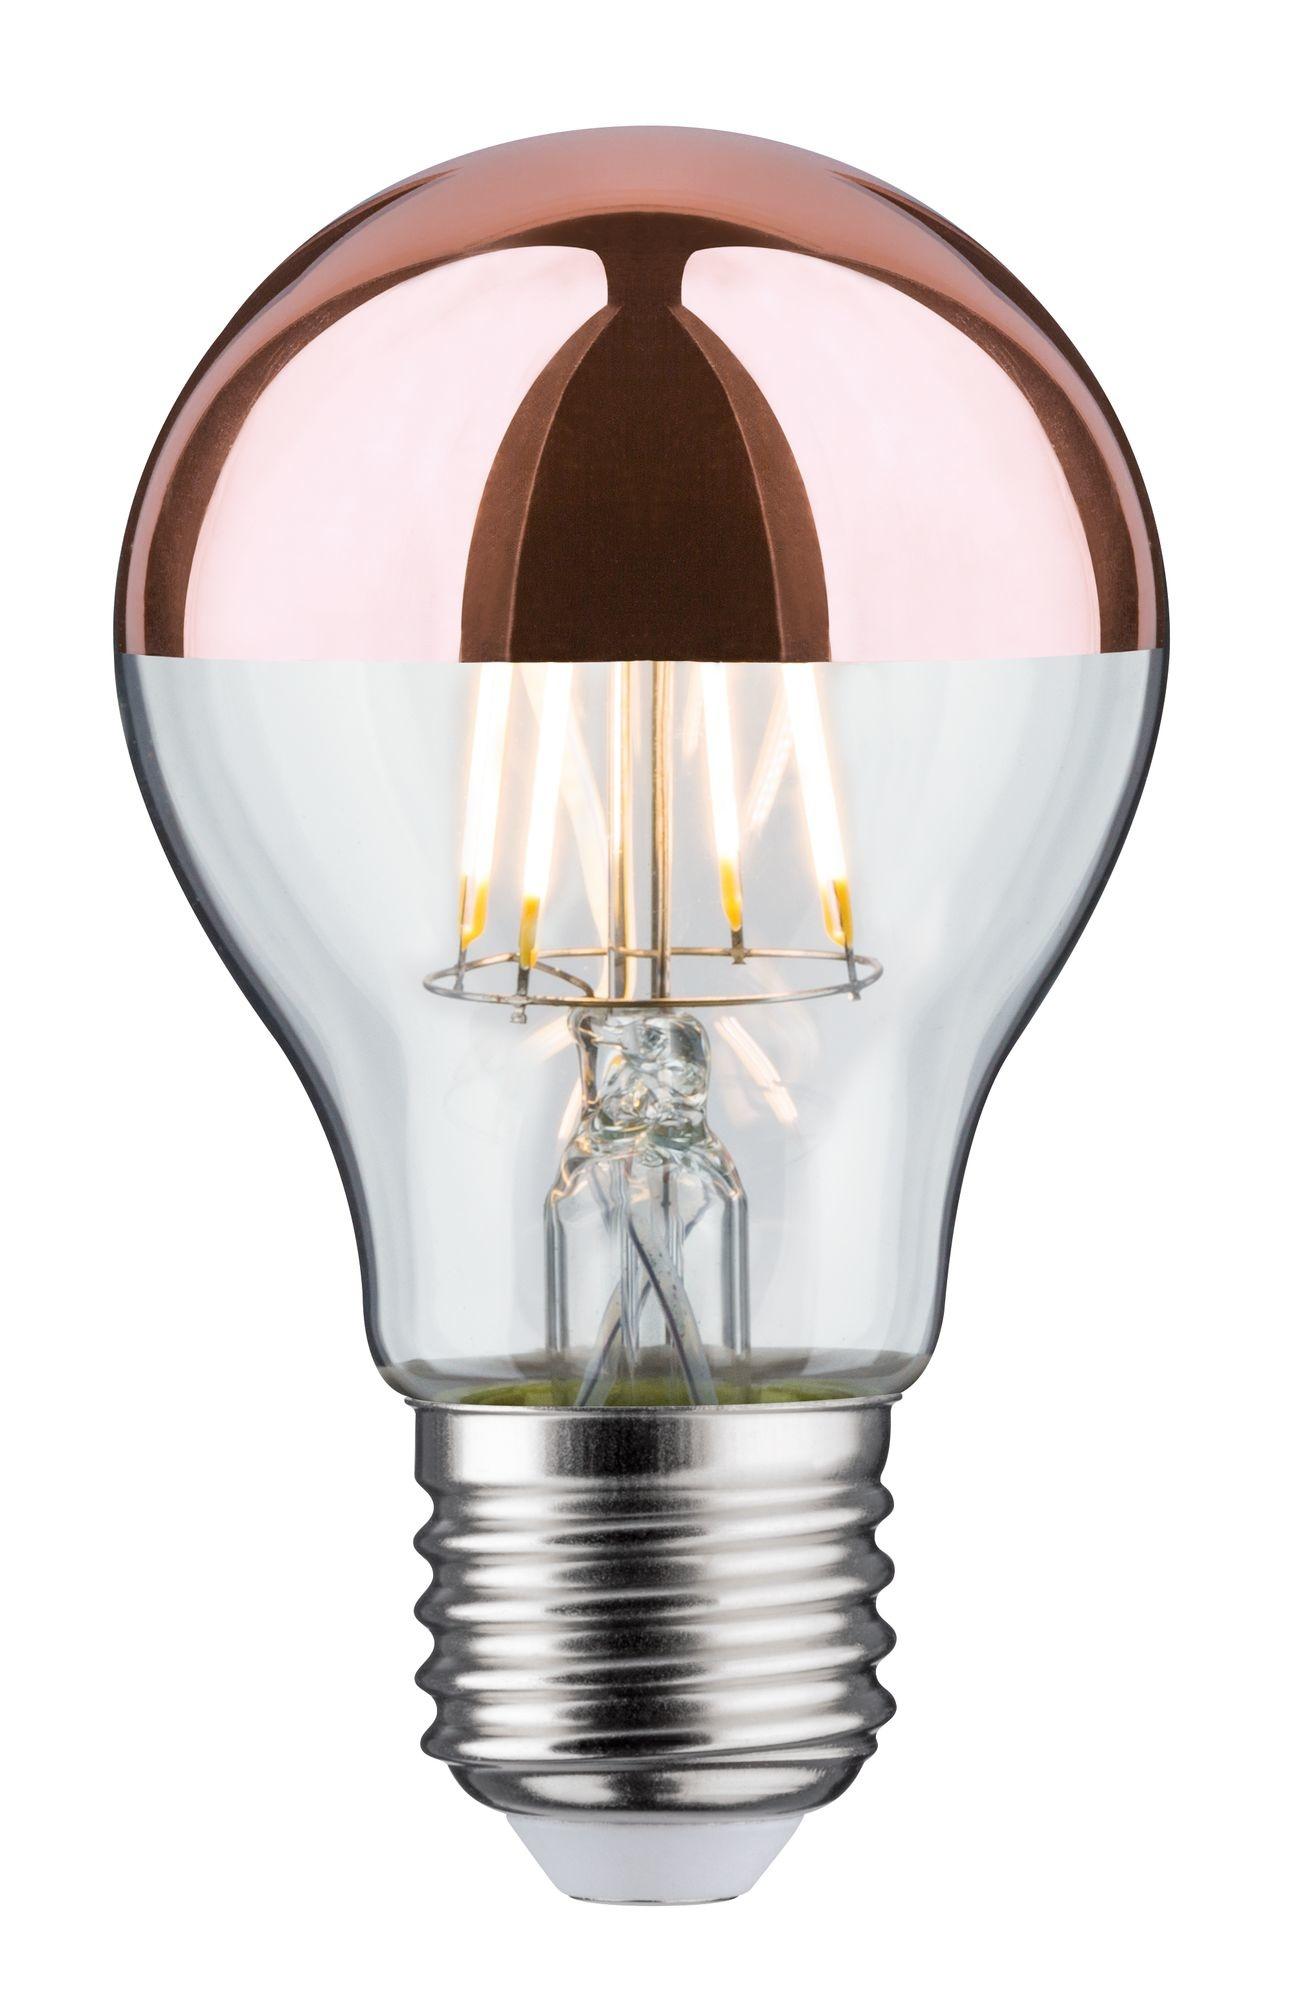 Paulmann LED Standardform 6,5 Watt E27 Kopfspiegel Kupfer Warmweiß